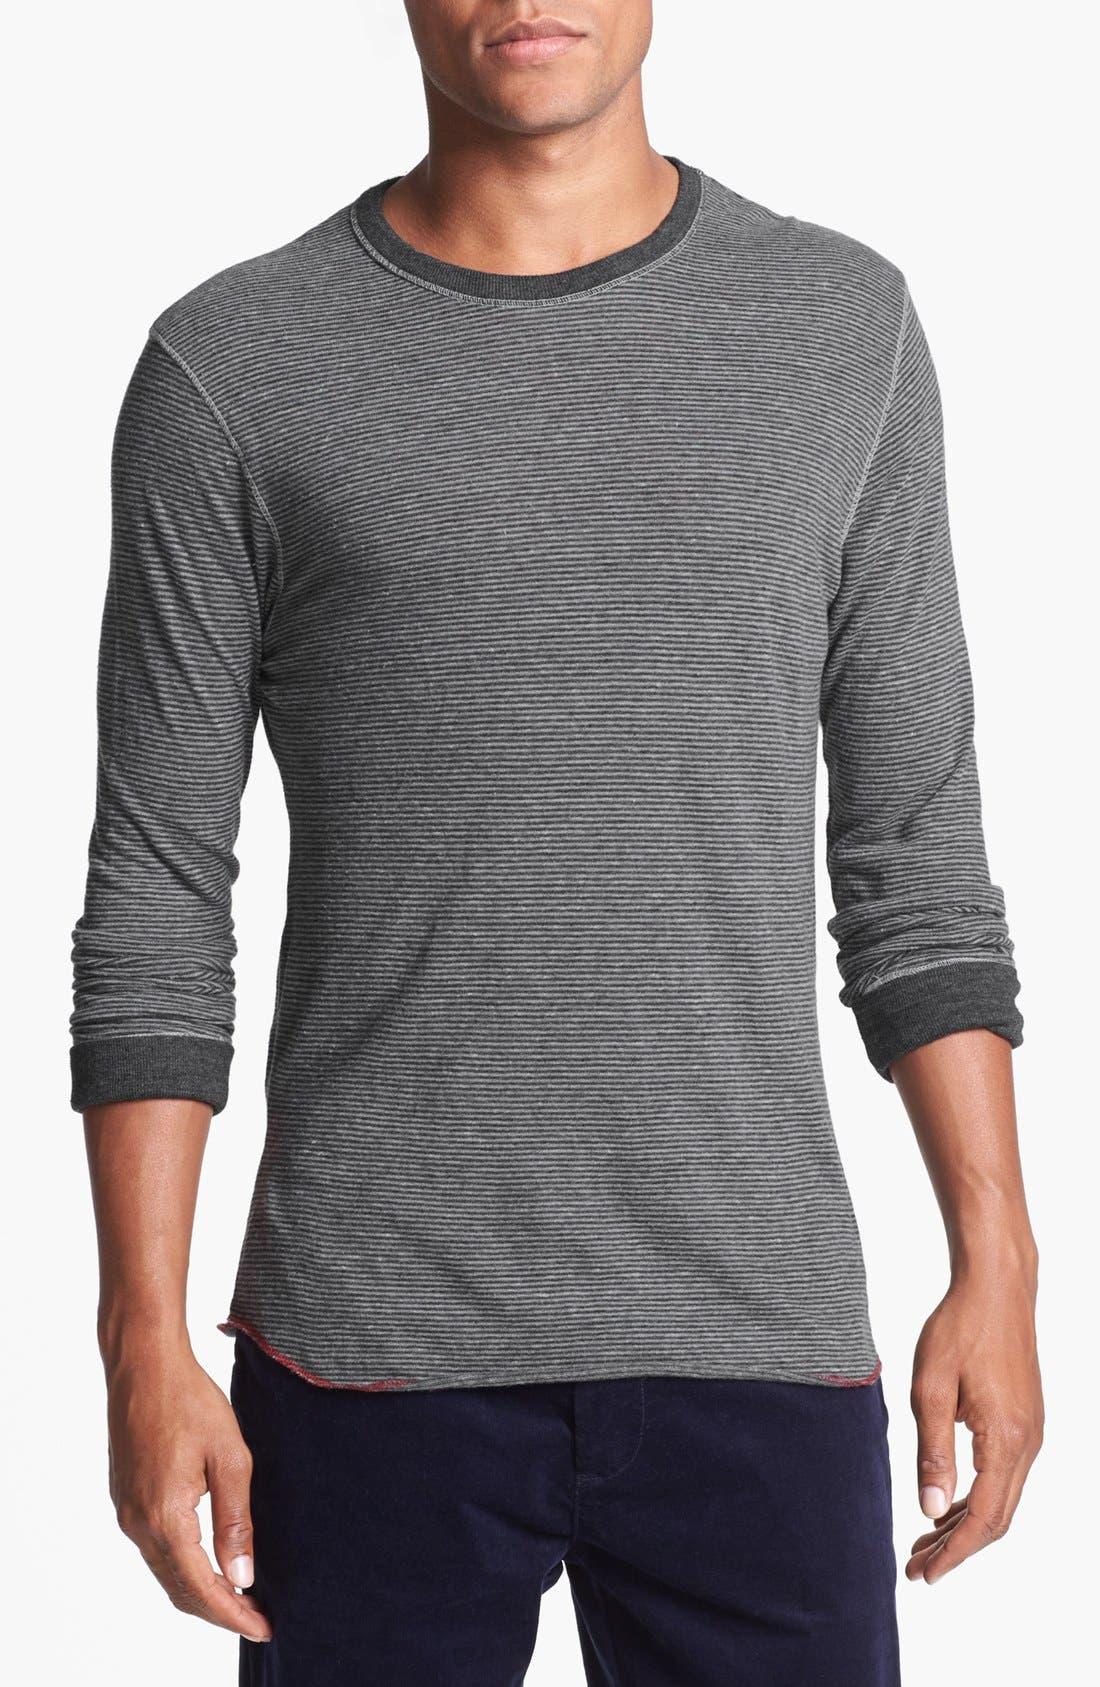 Main Image - Alternative 'Feeder' Stripe Long Sleeve Crewneck T-Shirt